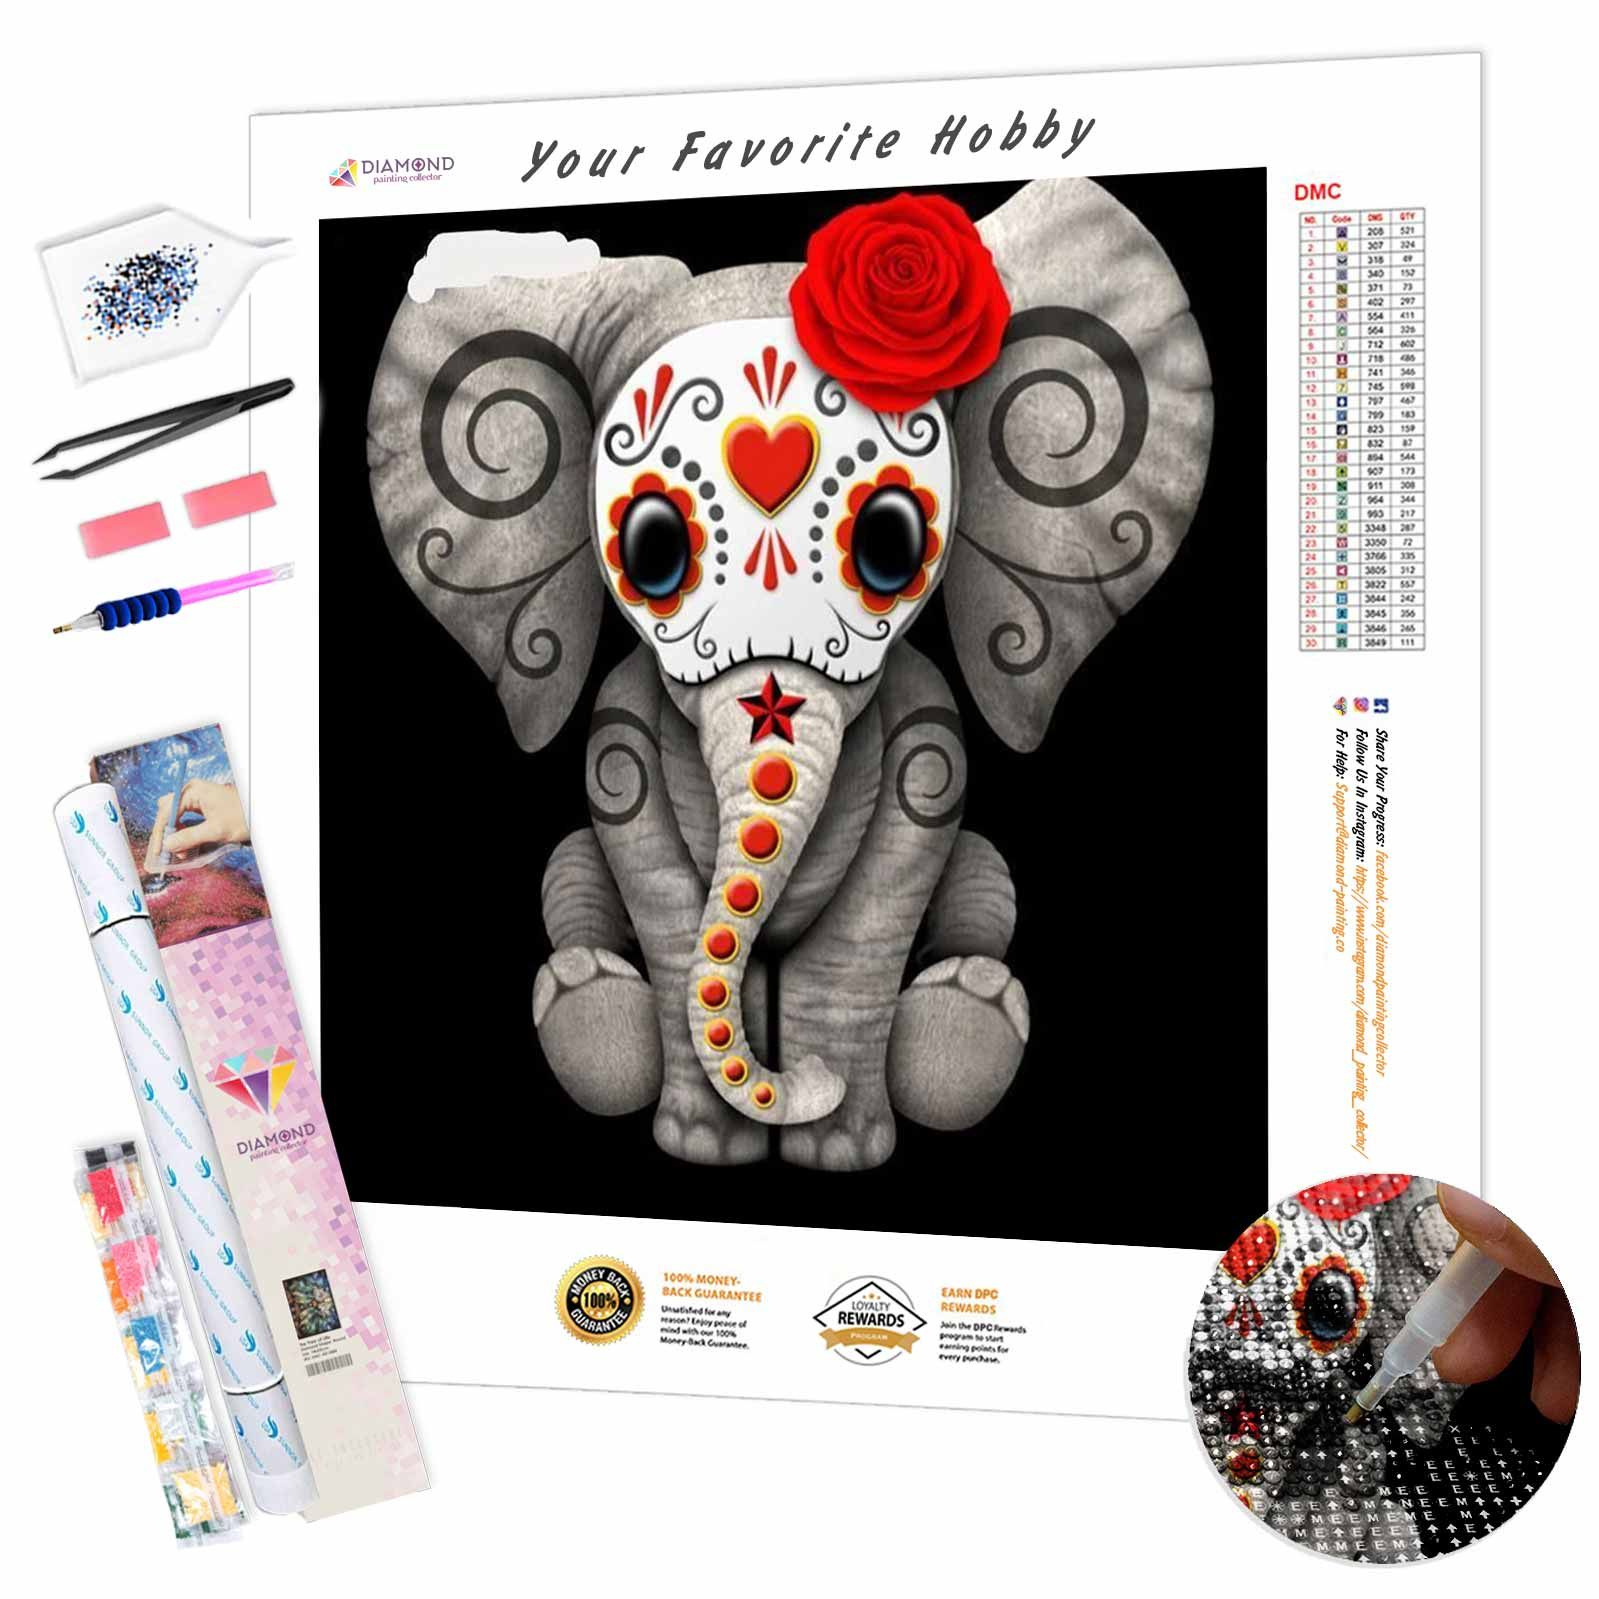 Baby Elephant skull DIY Diamond Painting Kit - Round 40x40cm16x16inch